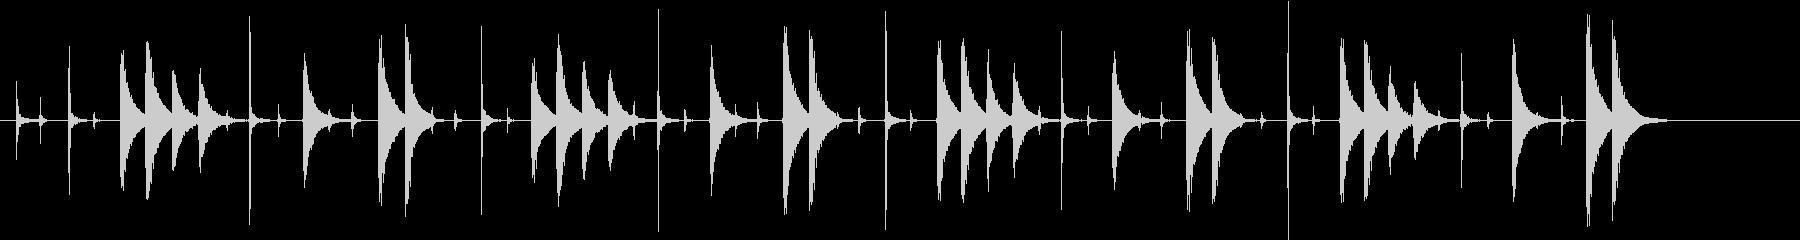 Two Drum Timbali:...の未再生の波形